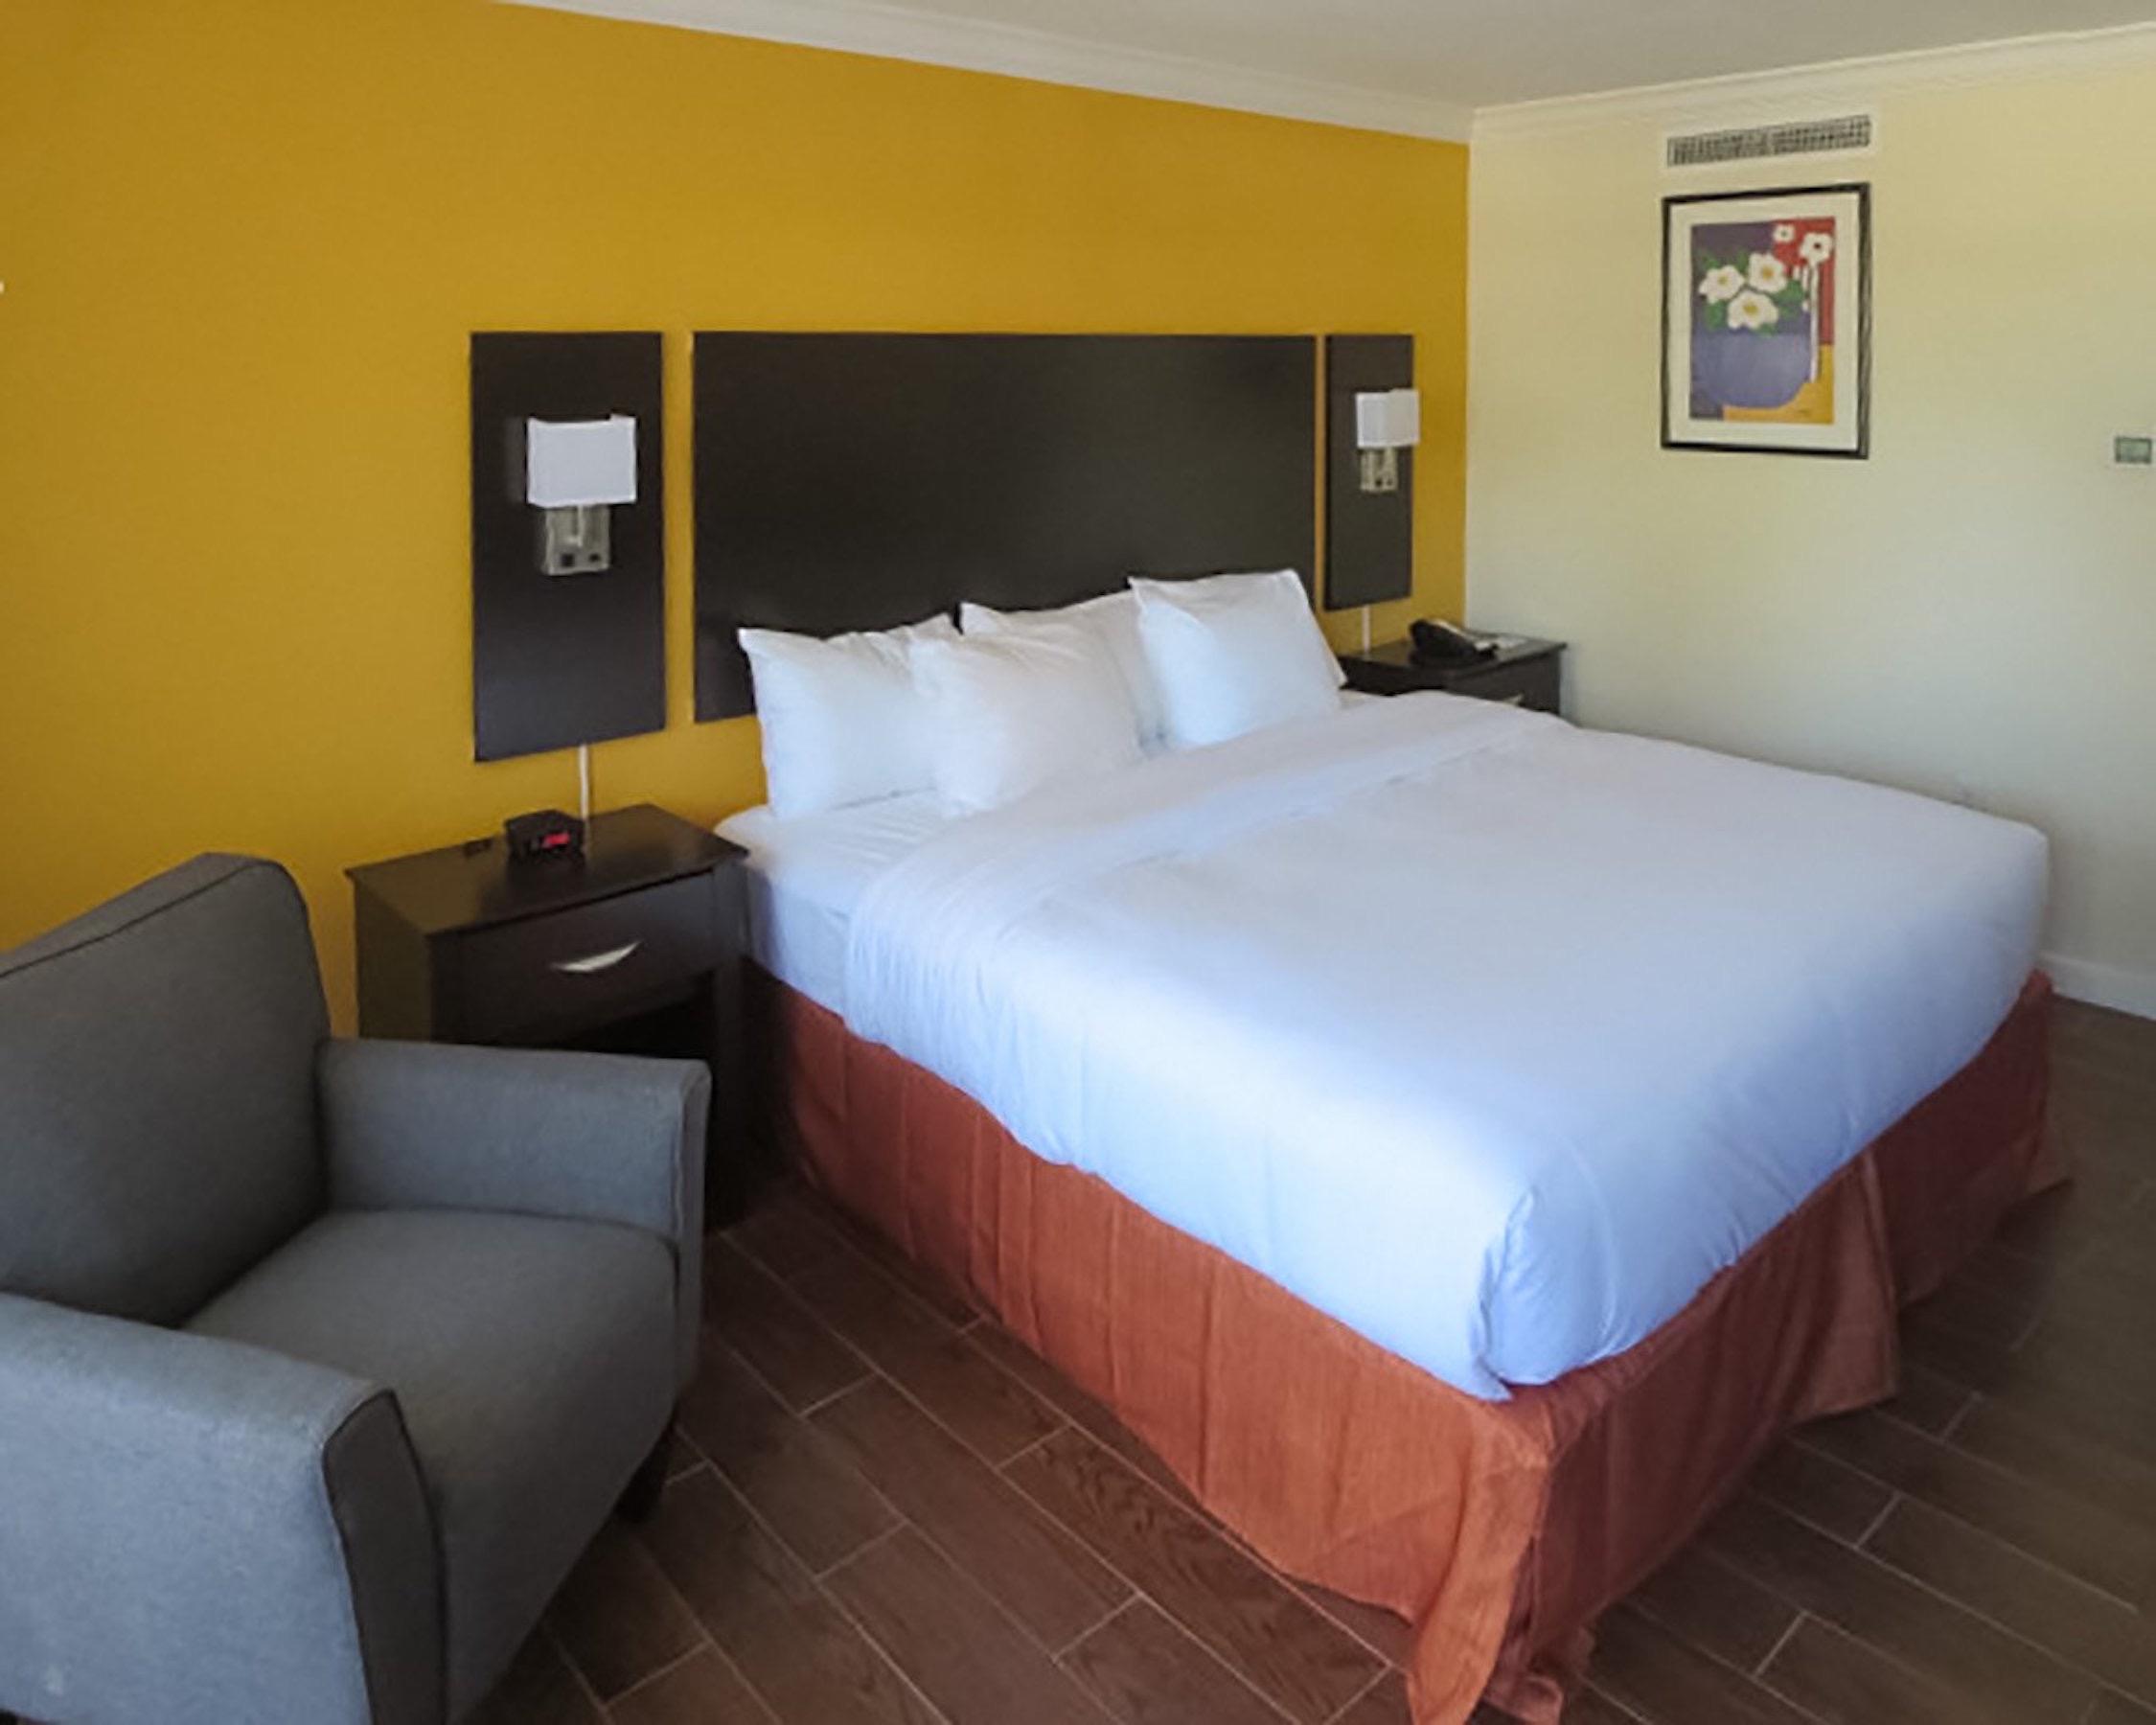 Clarion Inn image 1